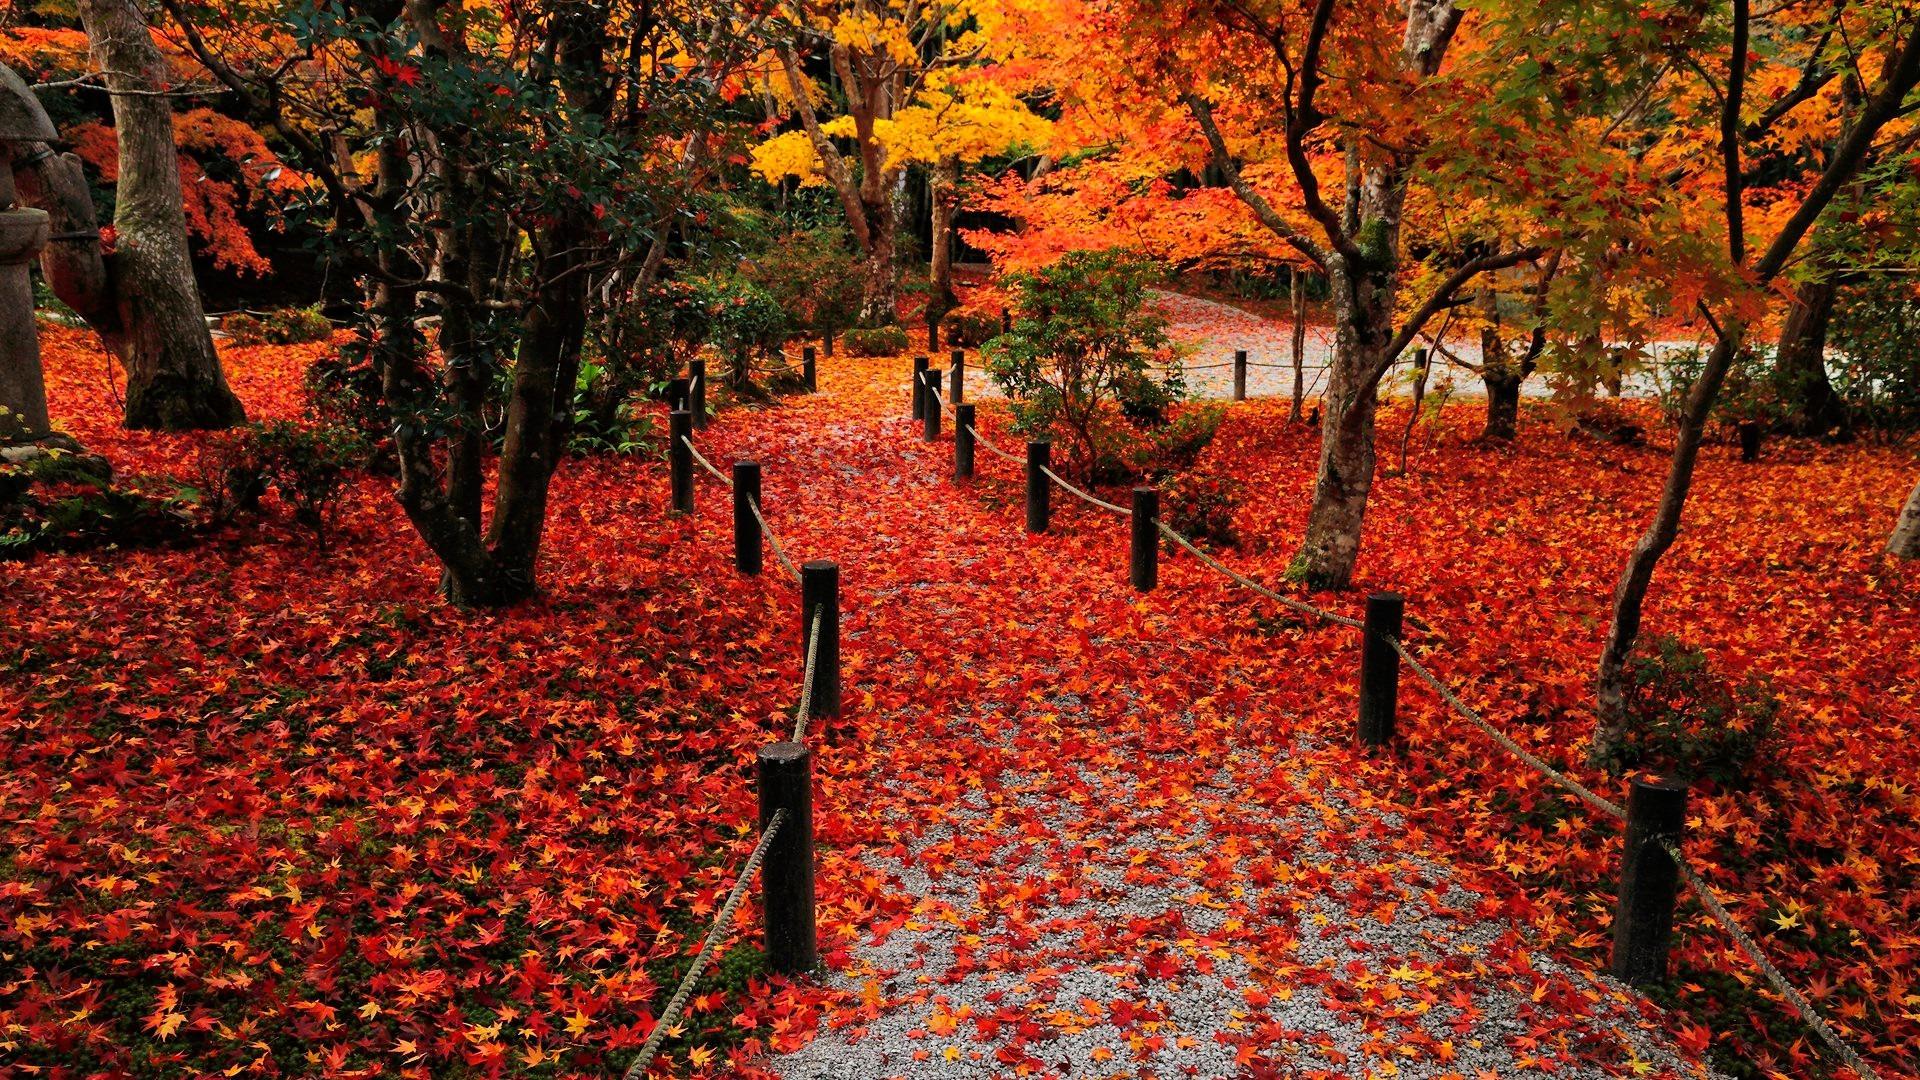 Autumn Leaves 1920x1080